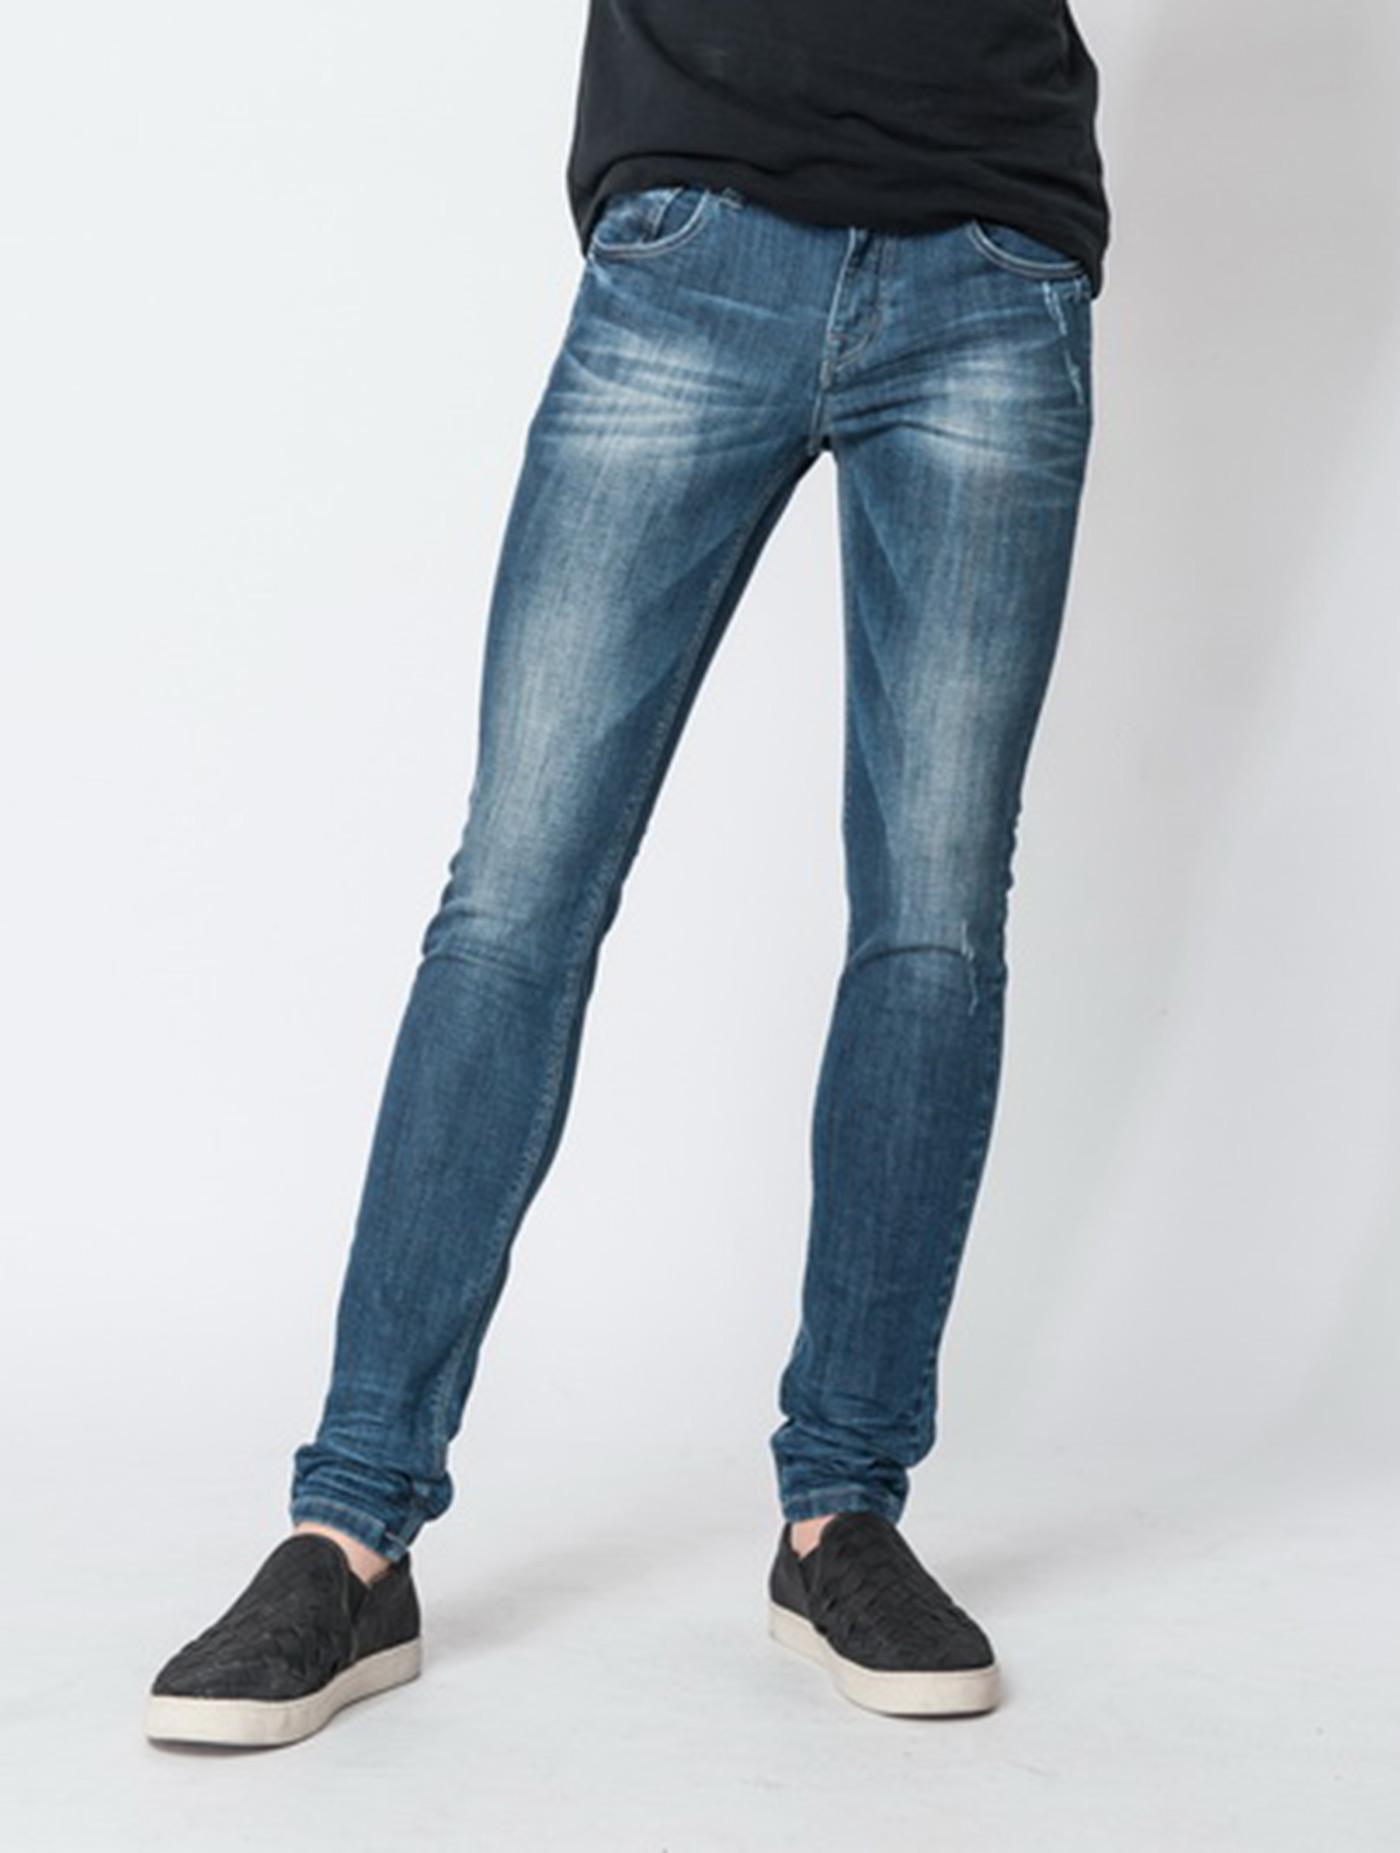 442d472e0df Ultra Skinny Jeans Jeans Size 28